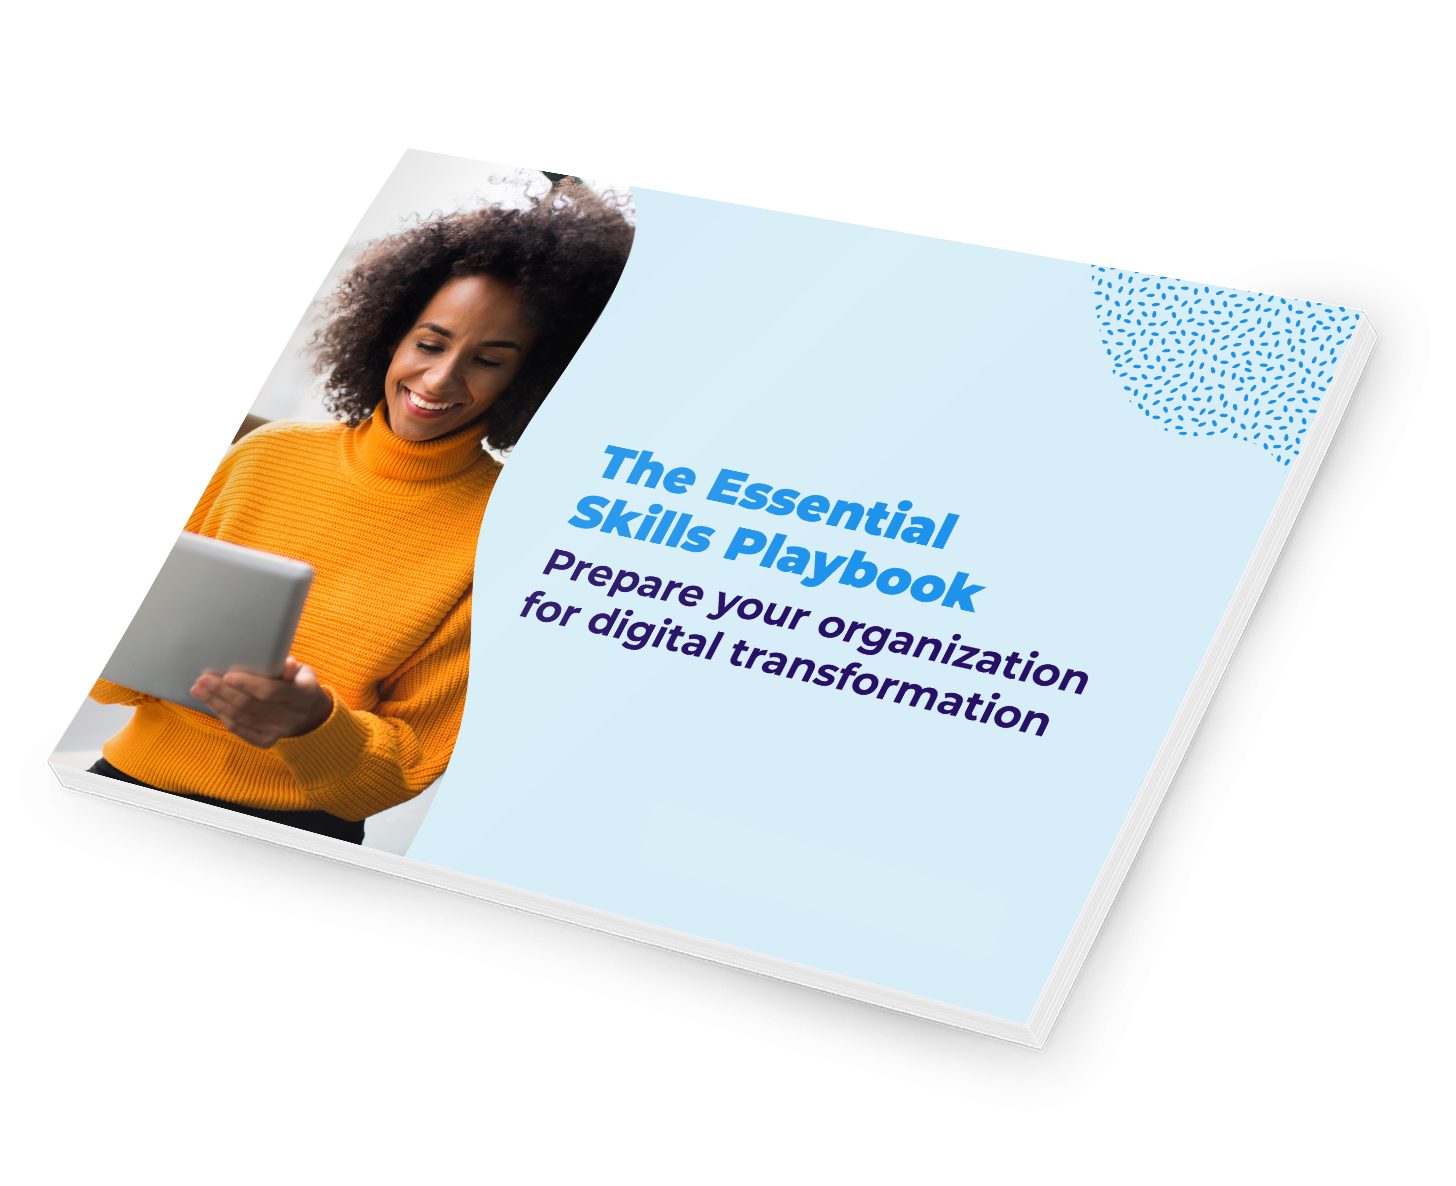 Coursera's Essential Skills Playbook